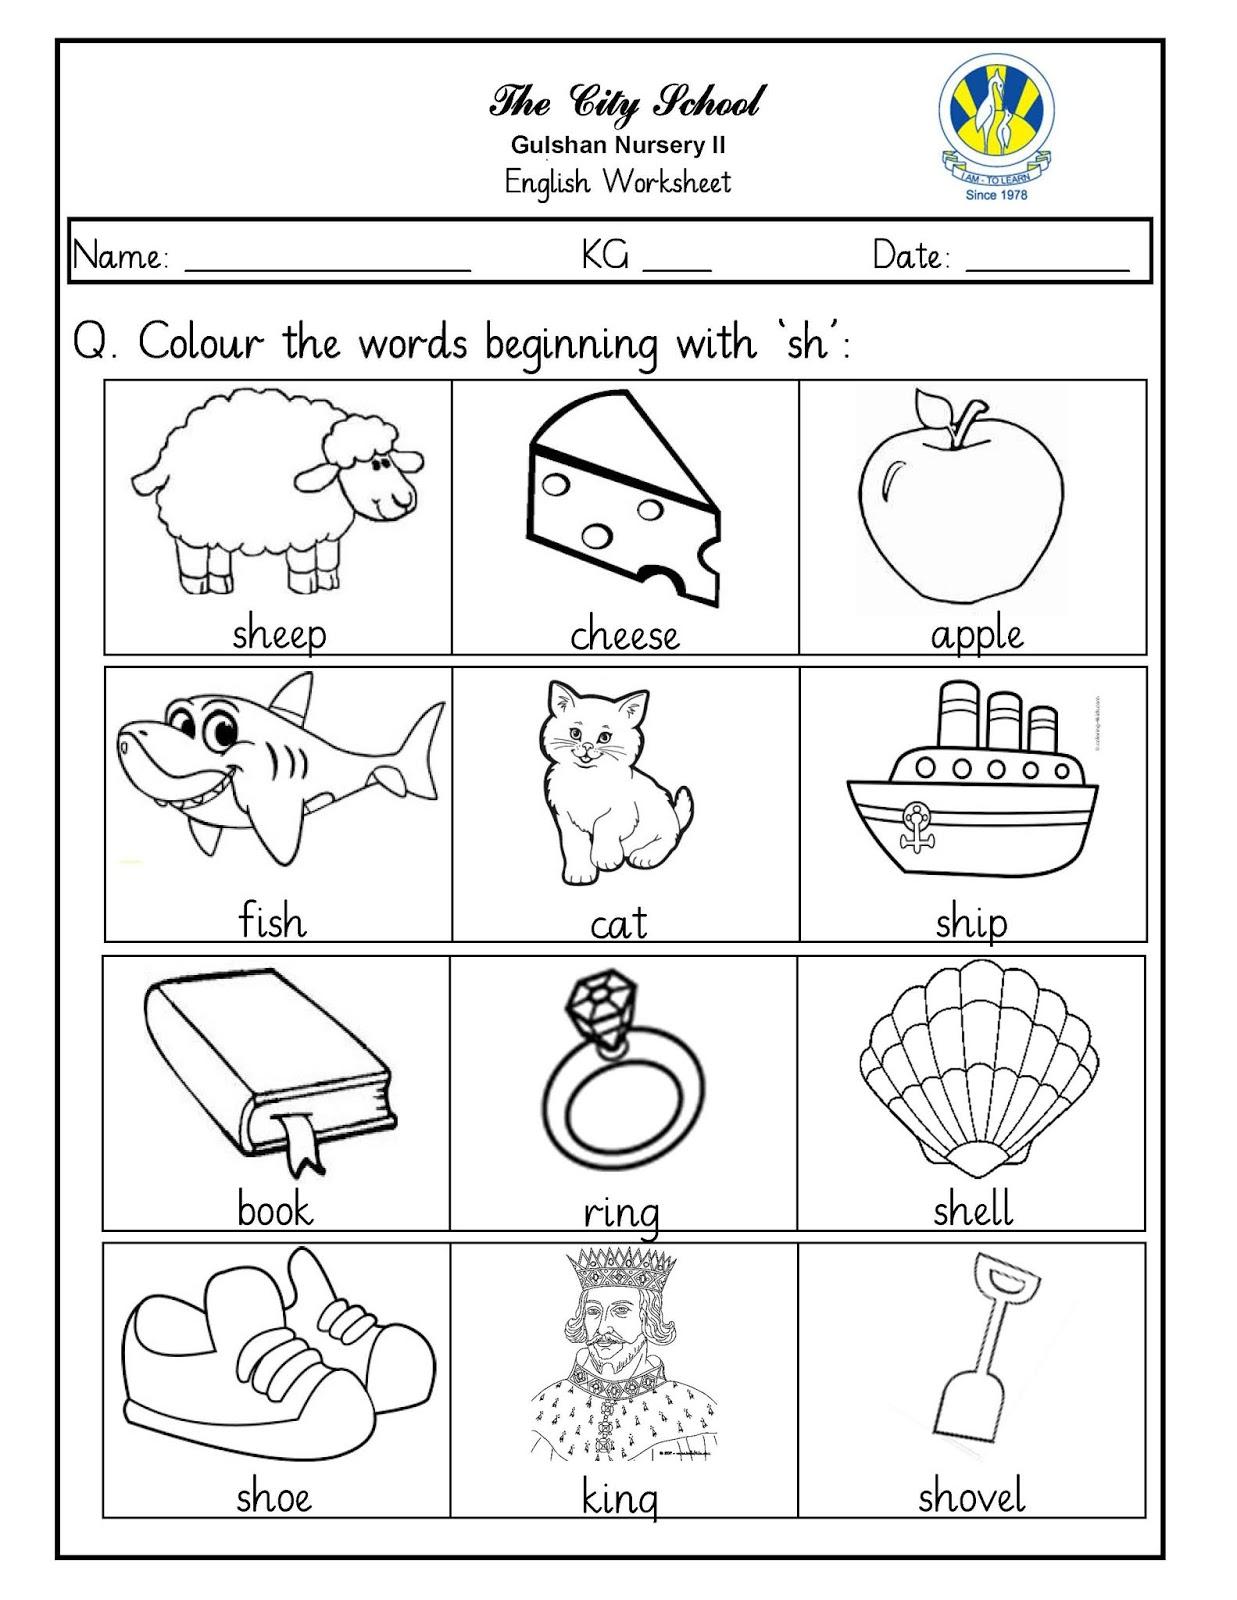 Sr Gulshan The City Nursery Ii English Worksheet